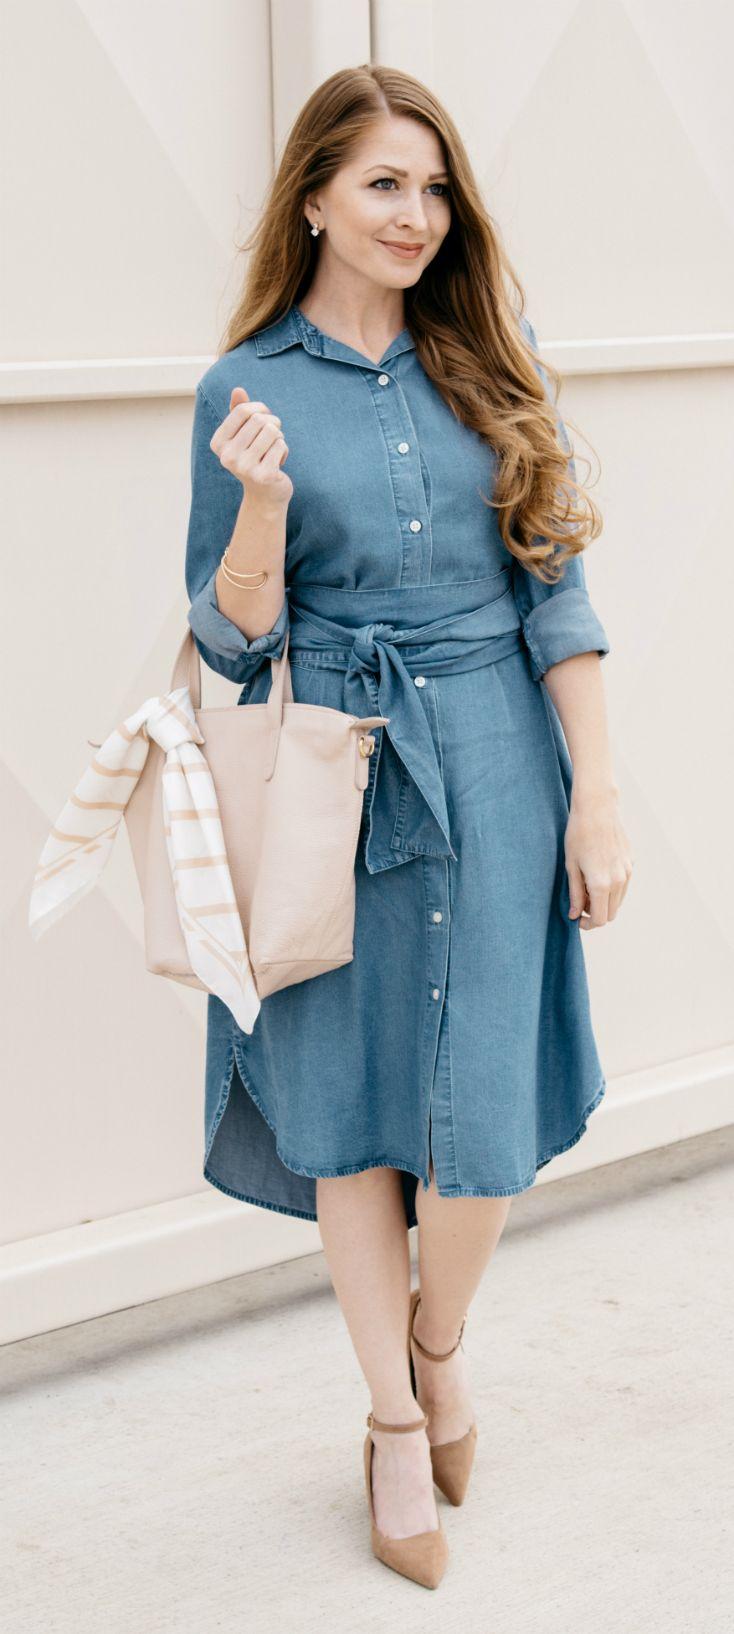 GAP Denim Shirt Dress / Chambray Shirt Dress / Cuyana Tote / Fashion / Classic Style / Outfit Ideas